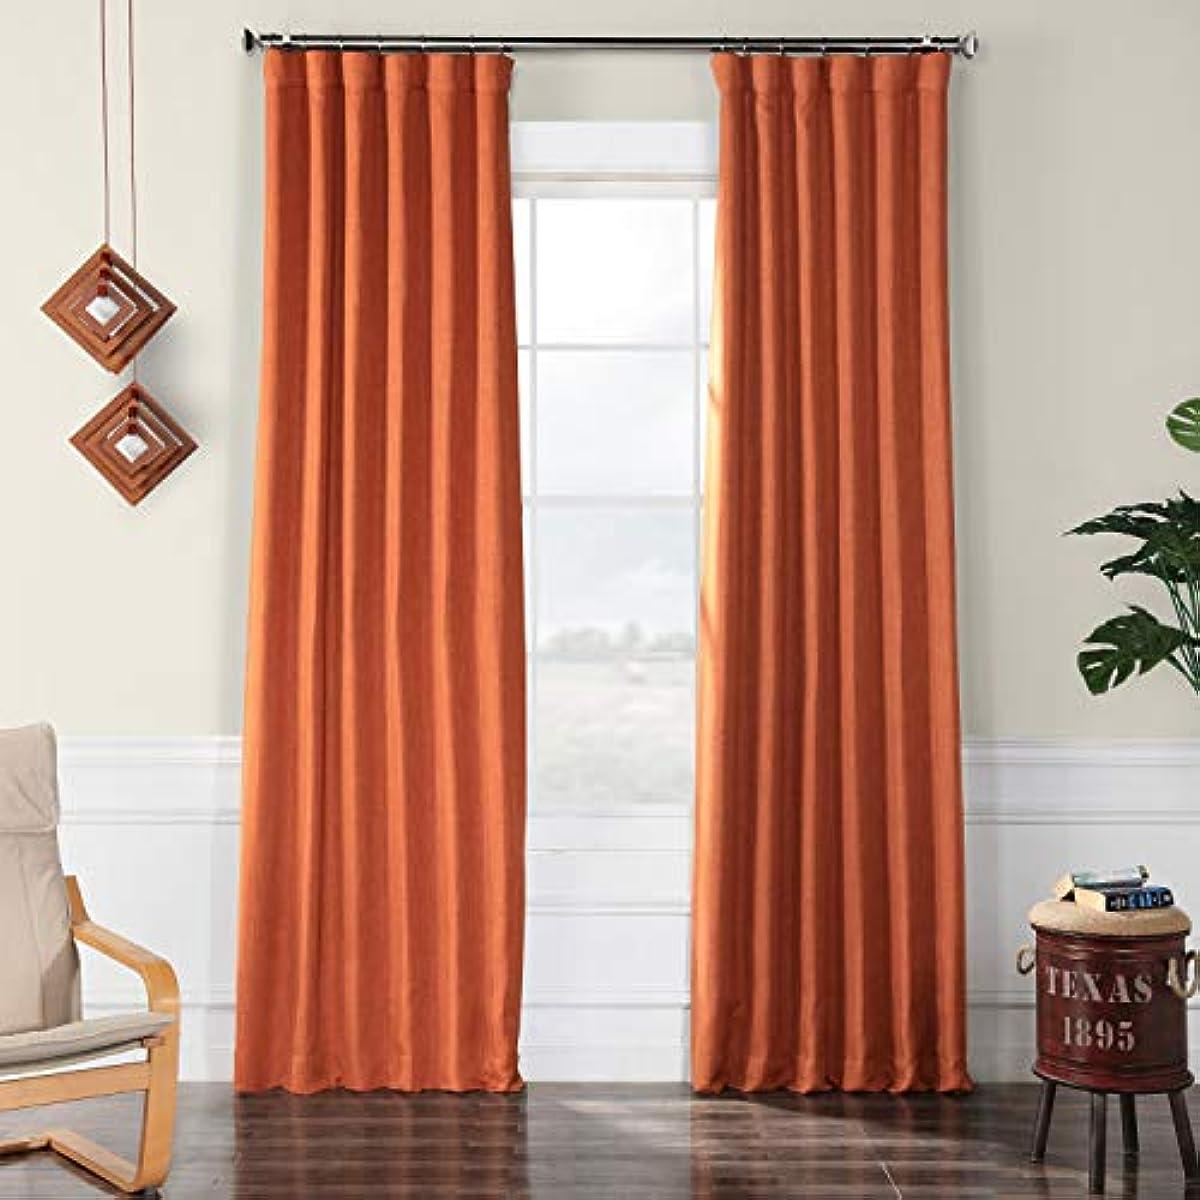 HPD Half Price Drapes BOCH-LN18517-108 Faux Linen Room Darkening Curtains, 50 x 108, Desert Orange